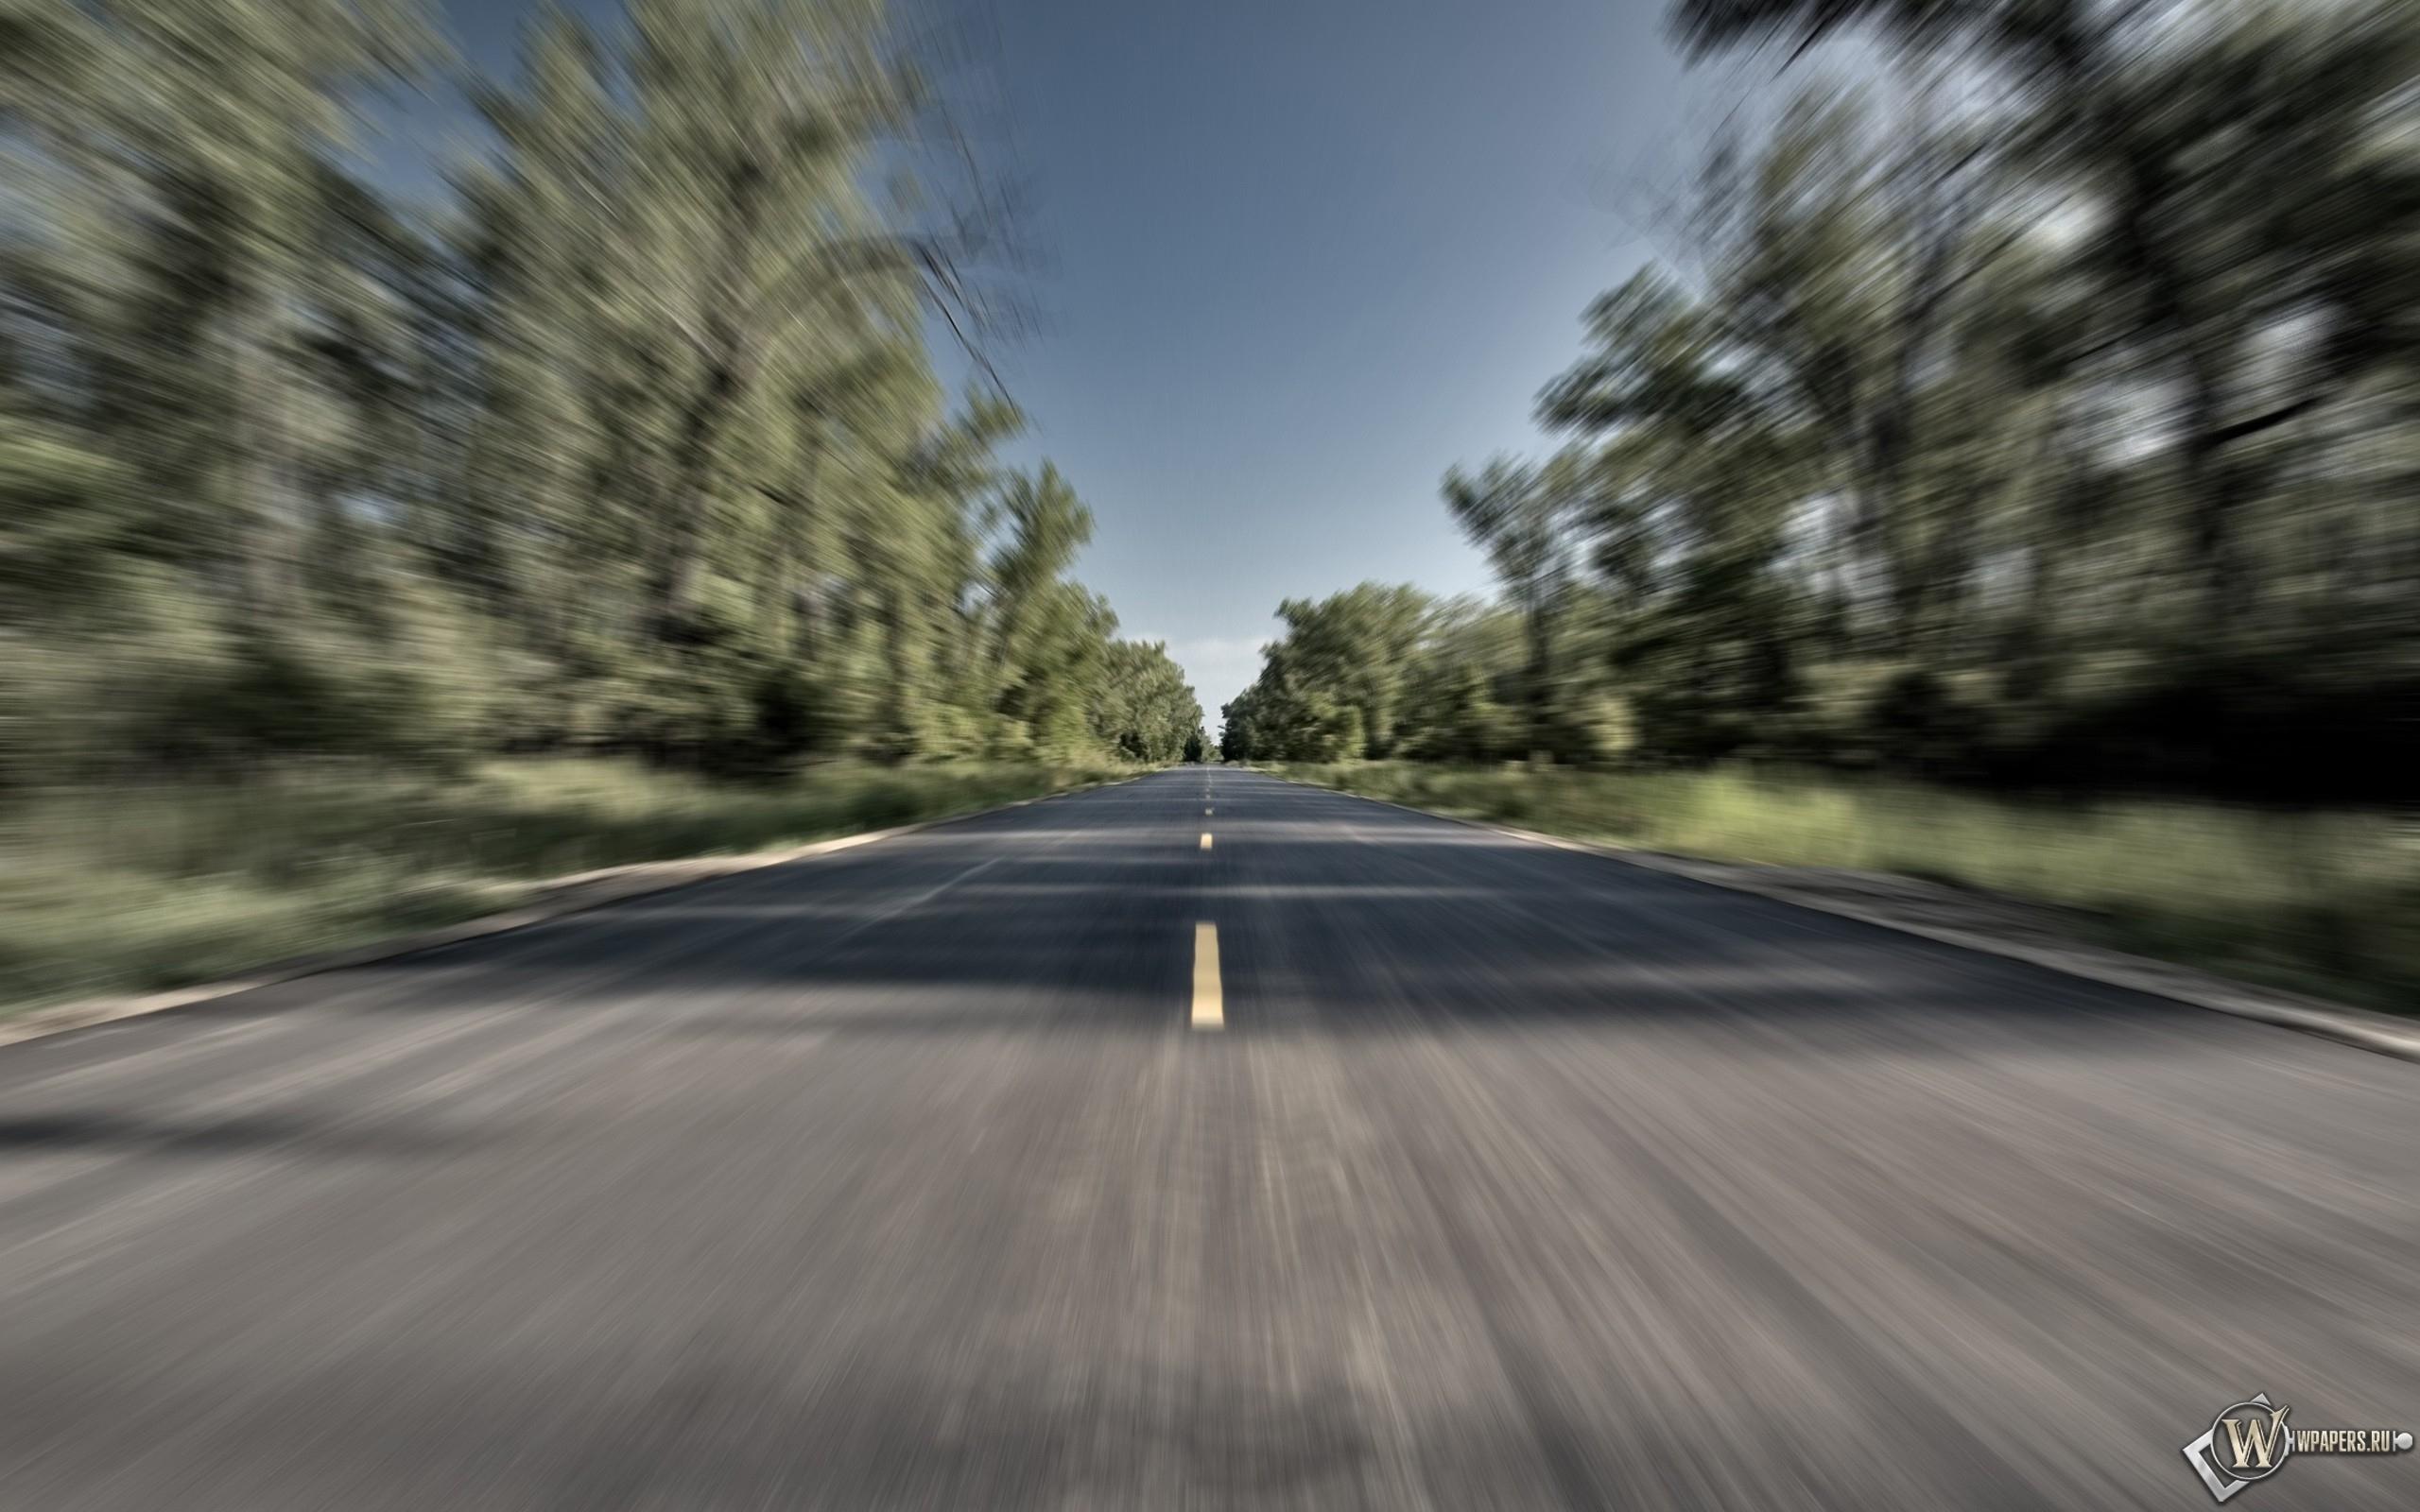 Разгон на дороге 2560x1600